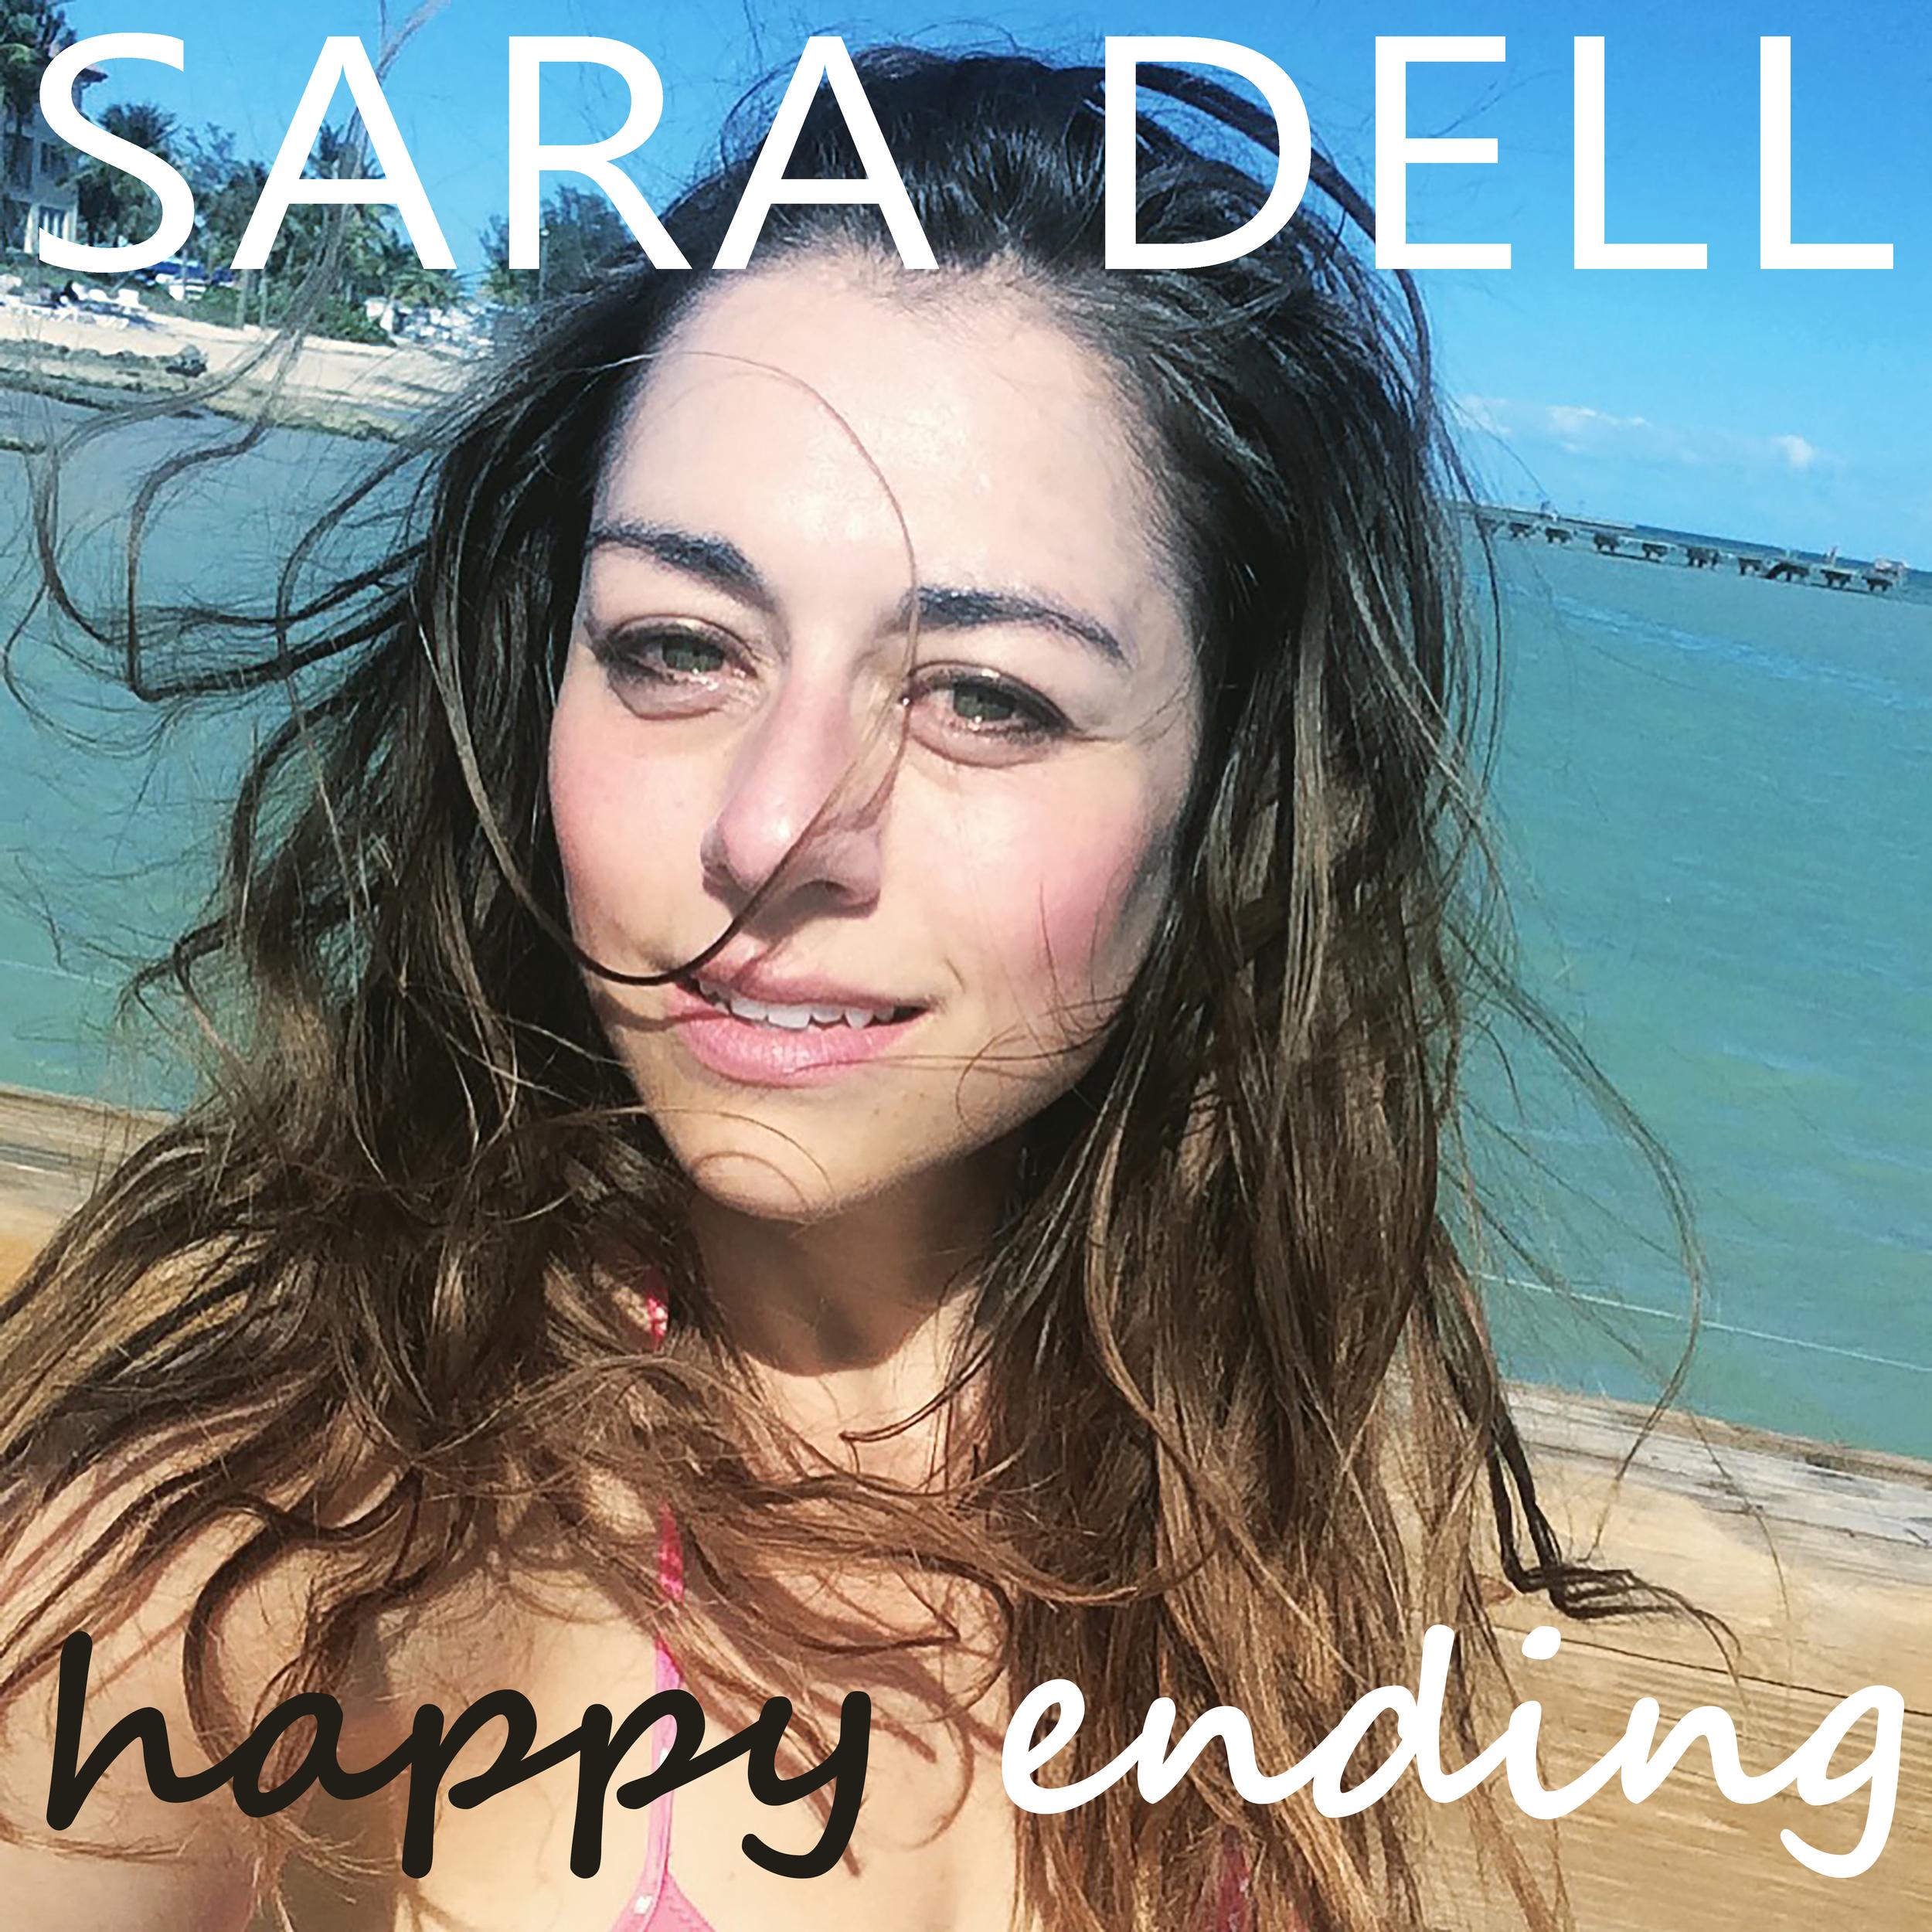 sara-dell-happy-ending-itunes-thumbnail.jpg